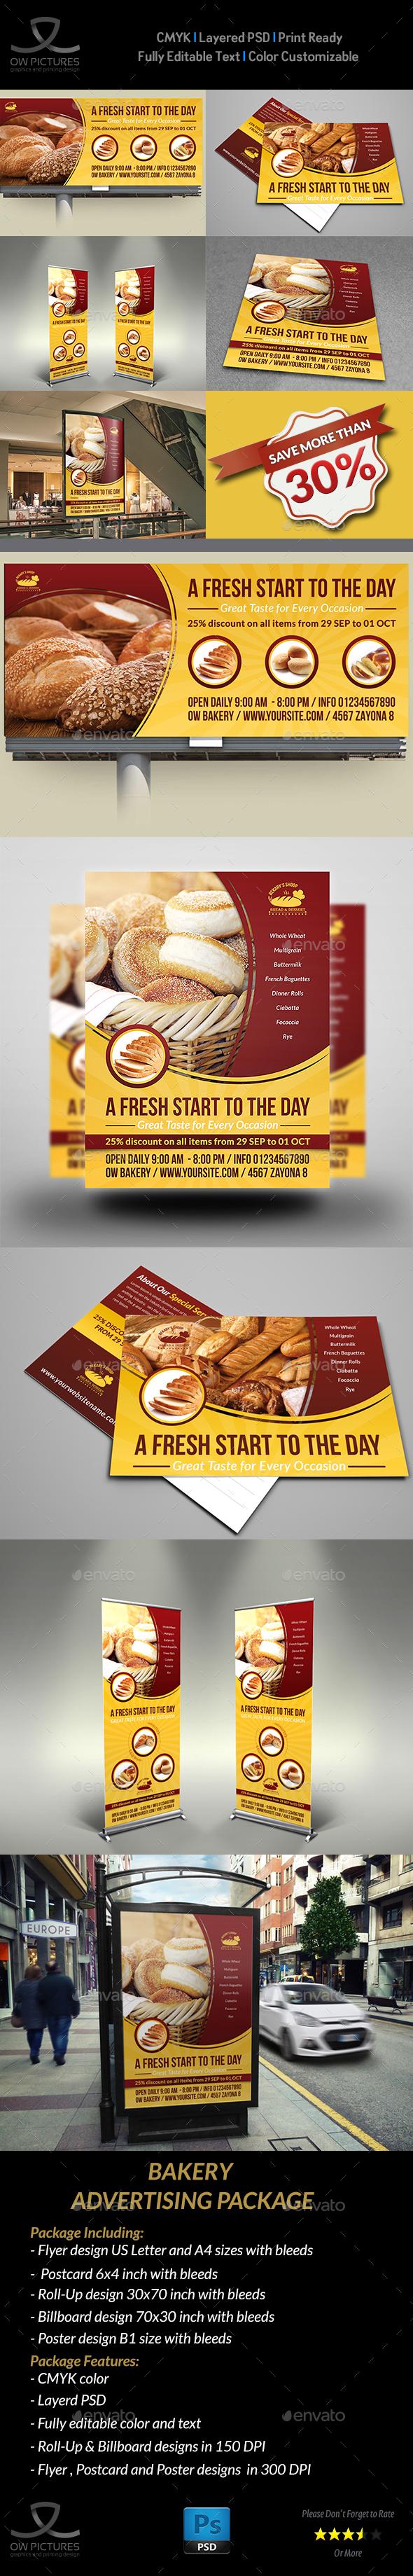 Bakery Advertising Bundle Vol.2 - Signage Print Templates